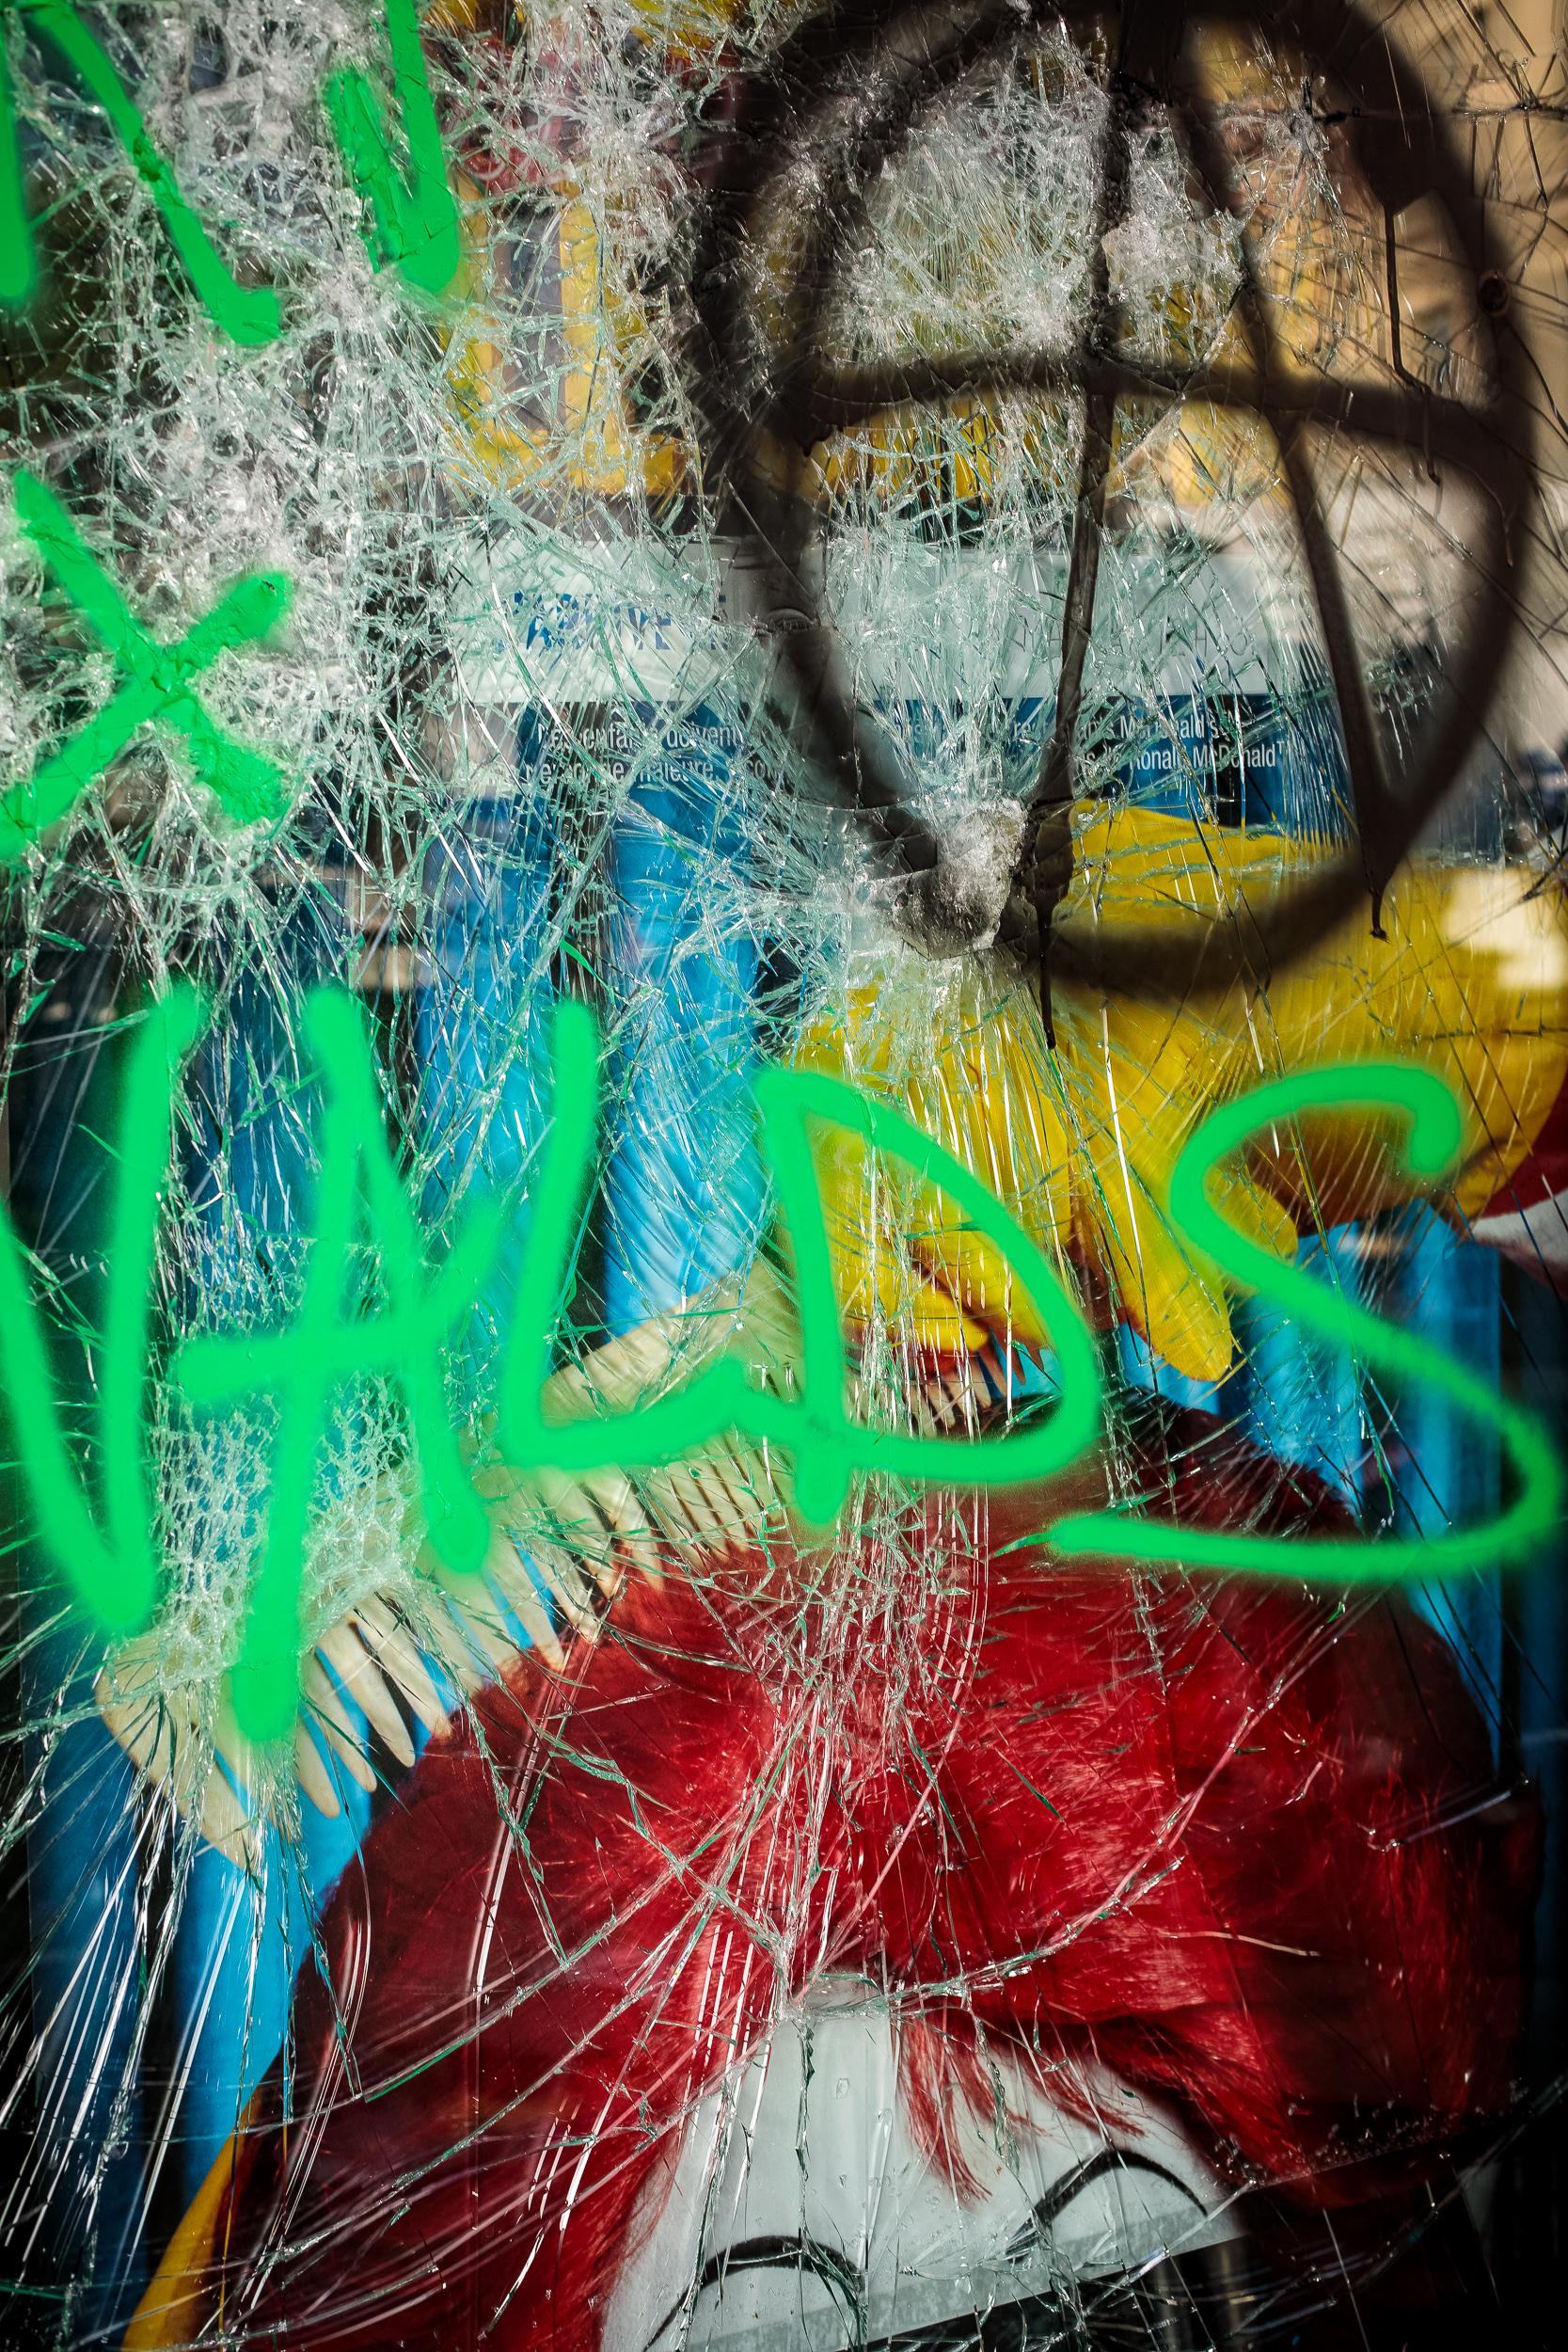 Shattered glass, spray paint & Ronald McDonald, 2018